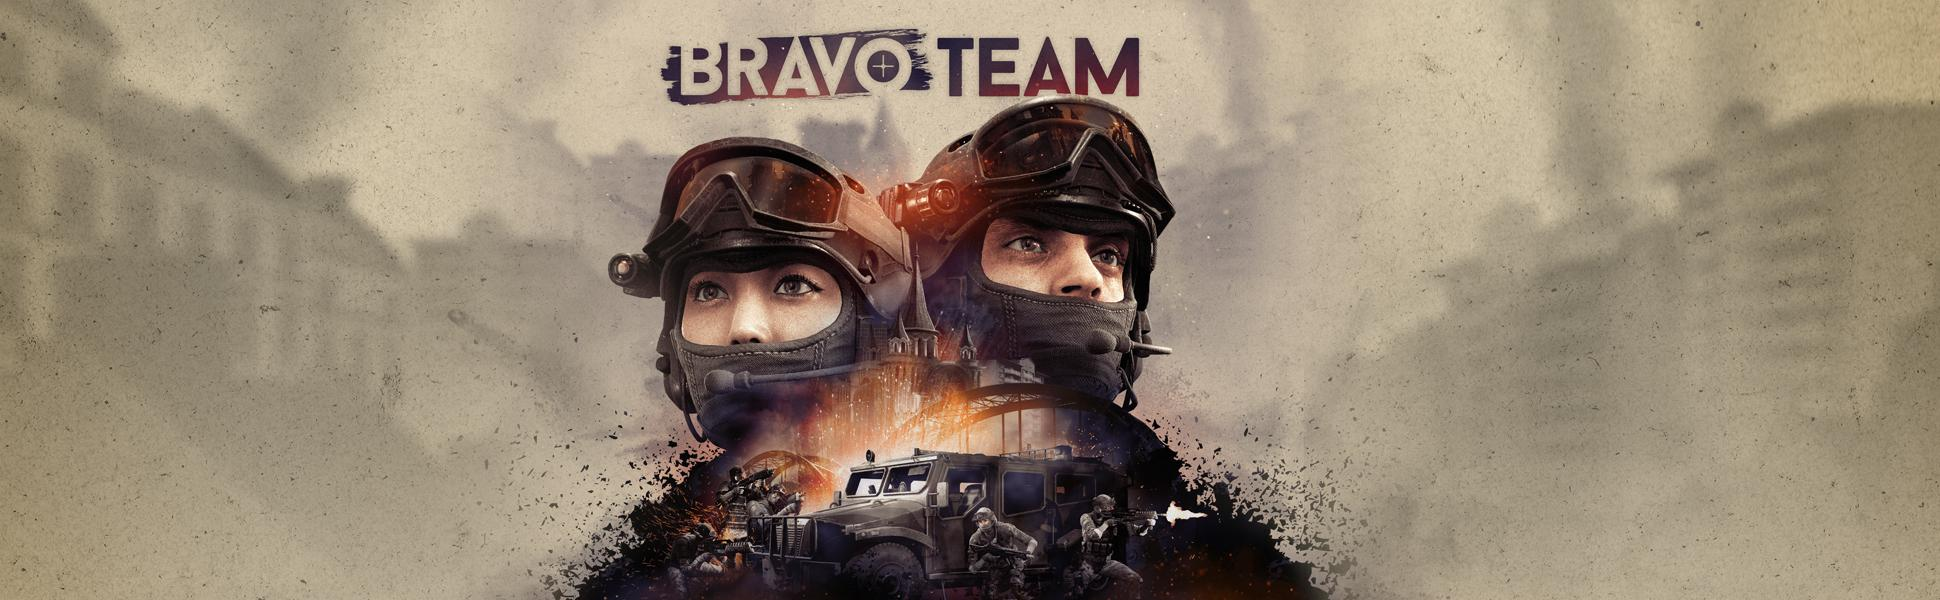 amazon com bravo team playstation vr video games